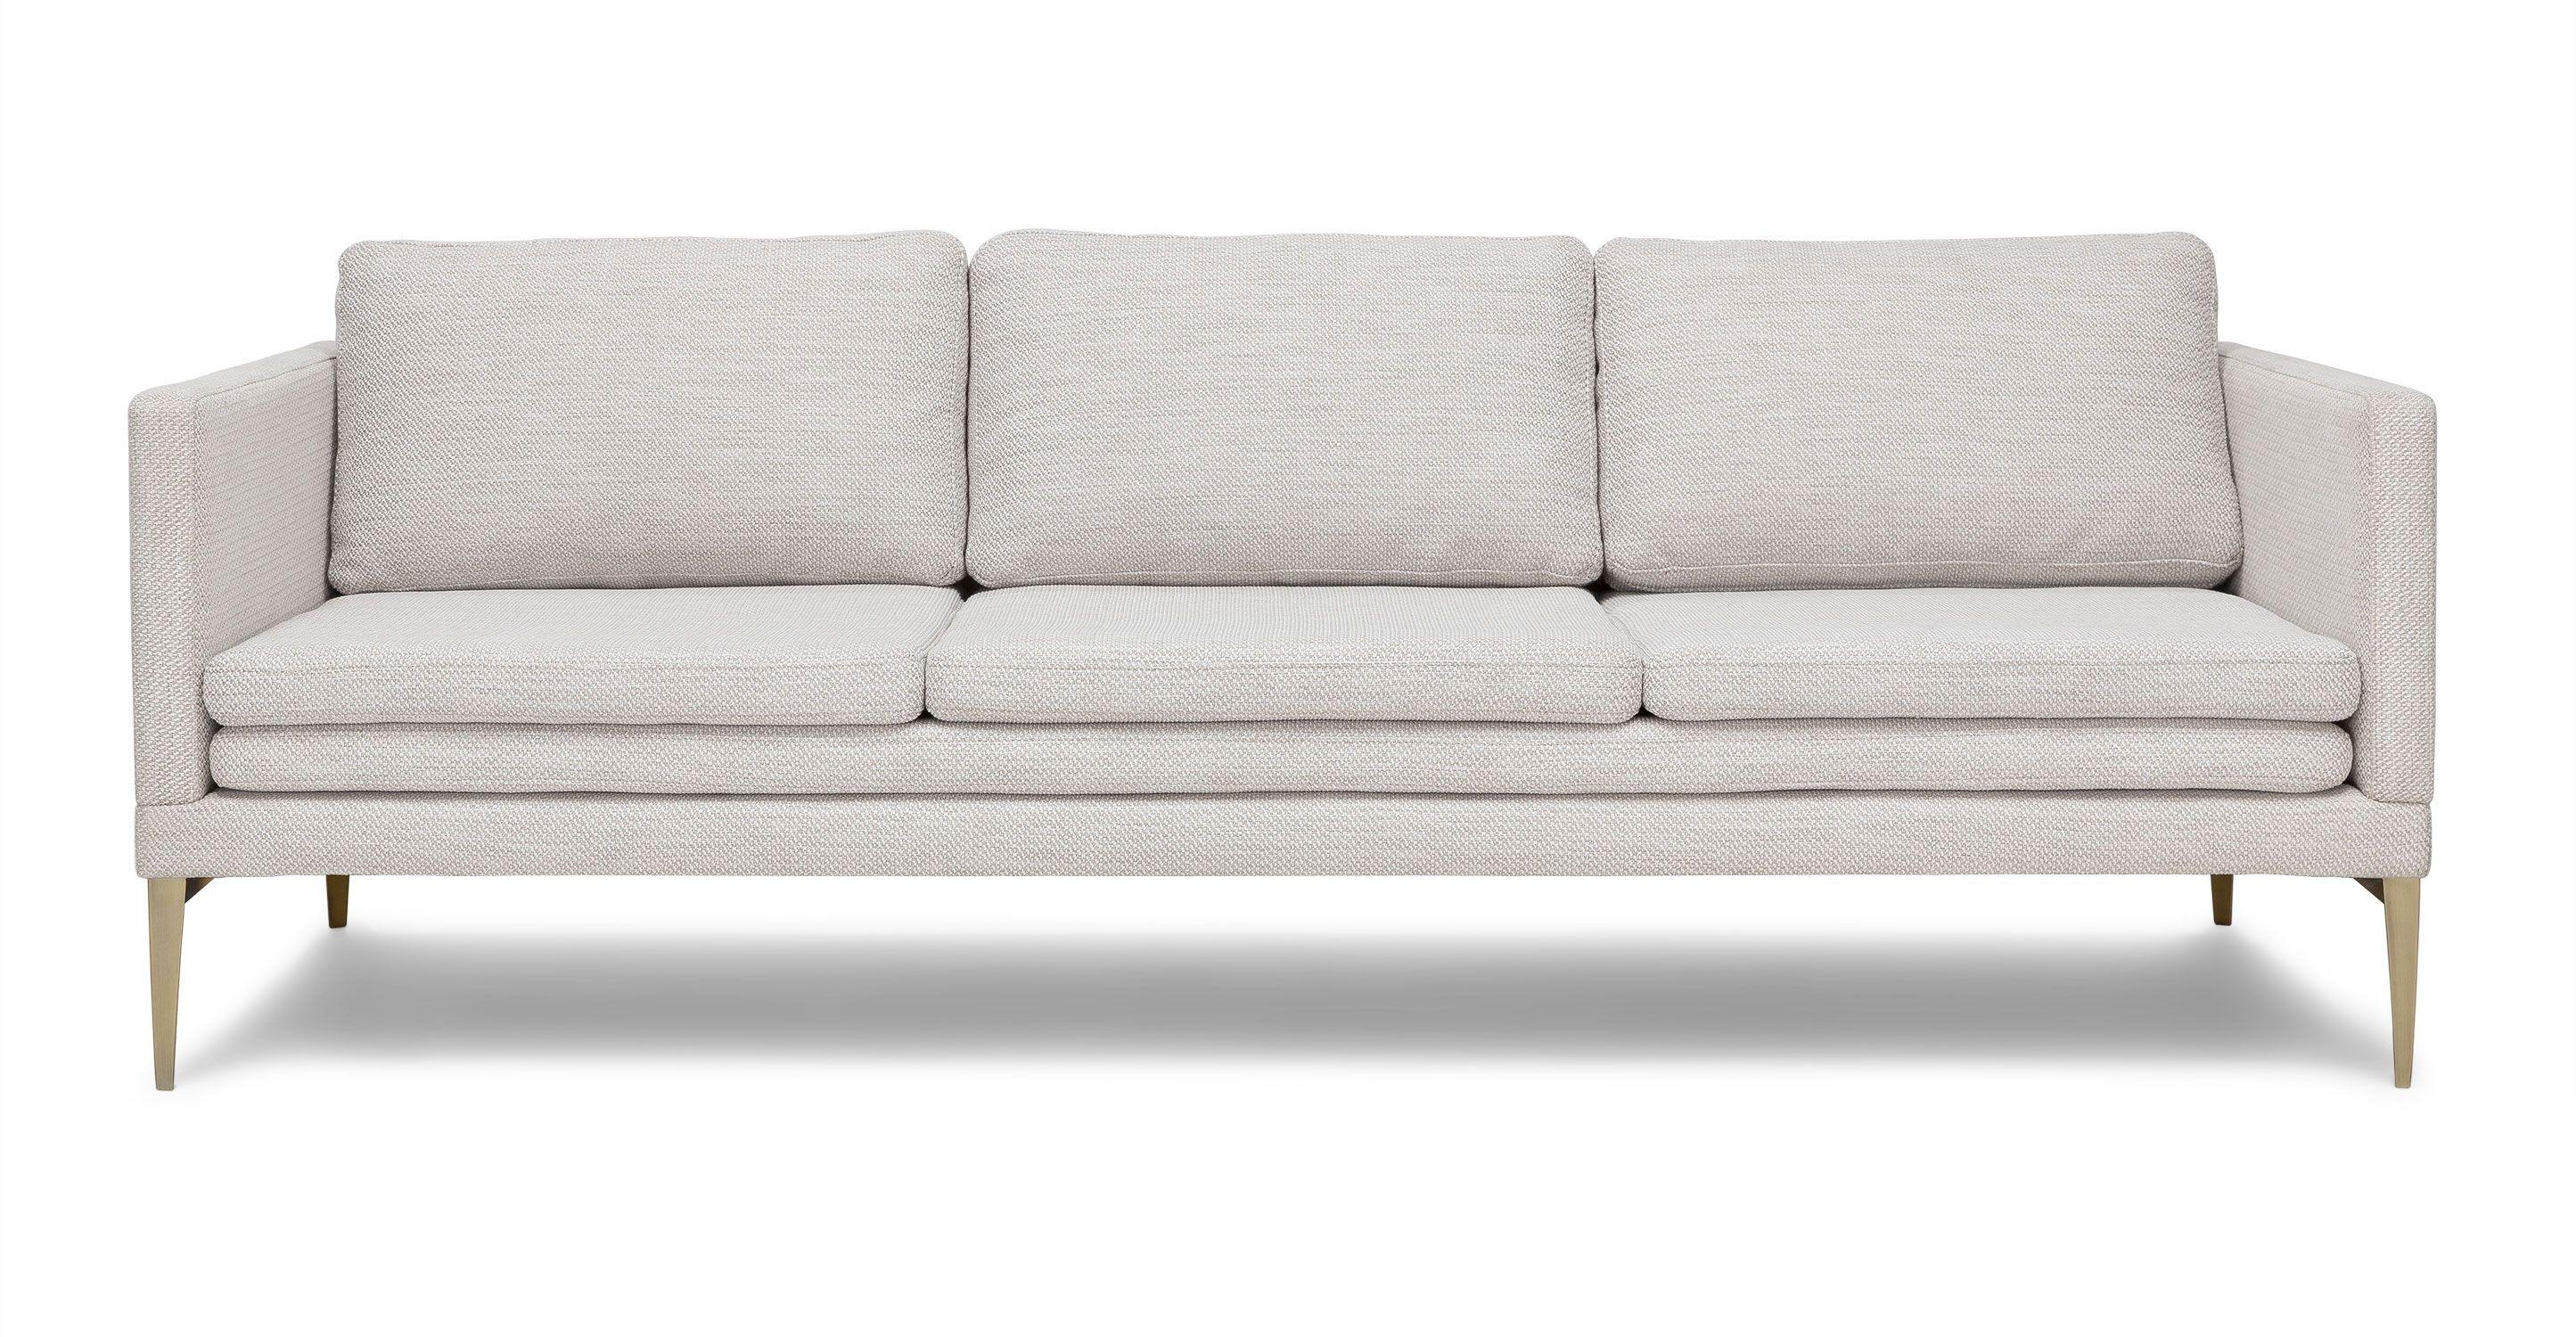 Triplo Milkyway Ivory Sofa Mid Century Modern Sofa Scandinavian